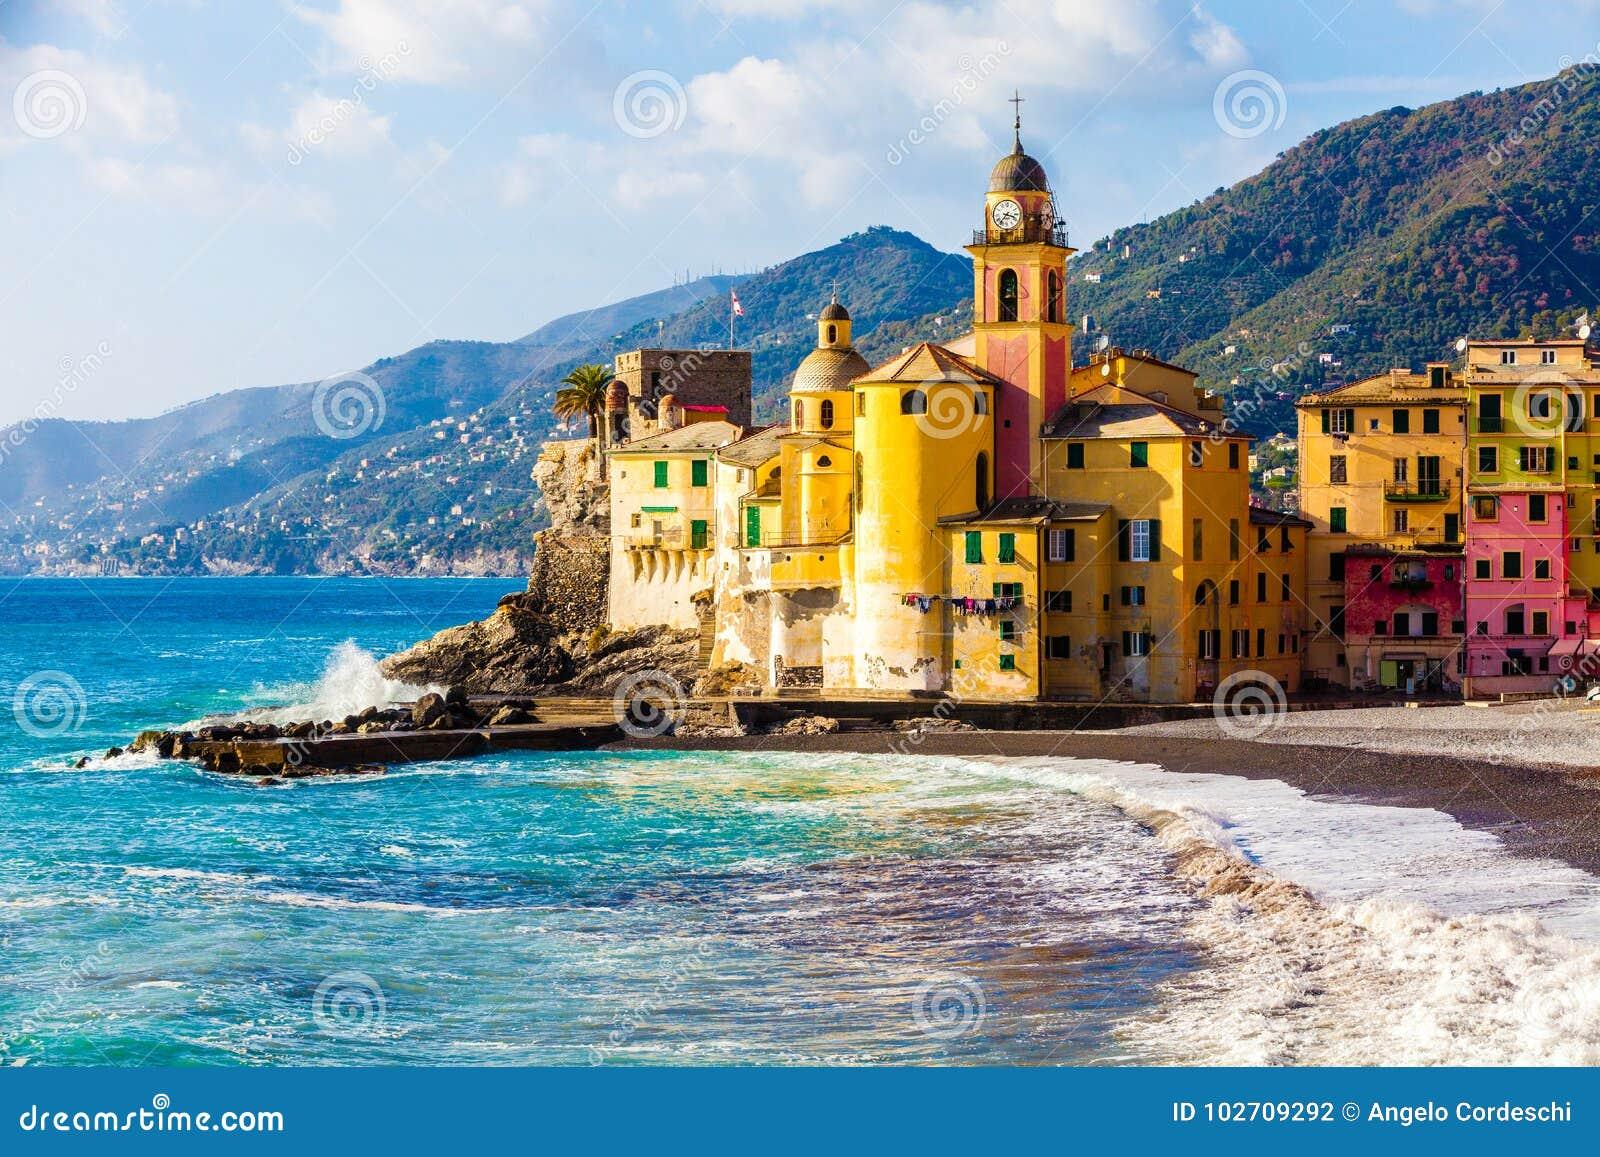 Сценарное среднеземноморское побережье Camogli riviera, Италия